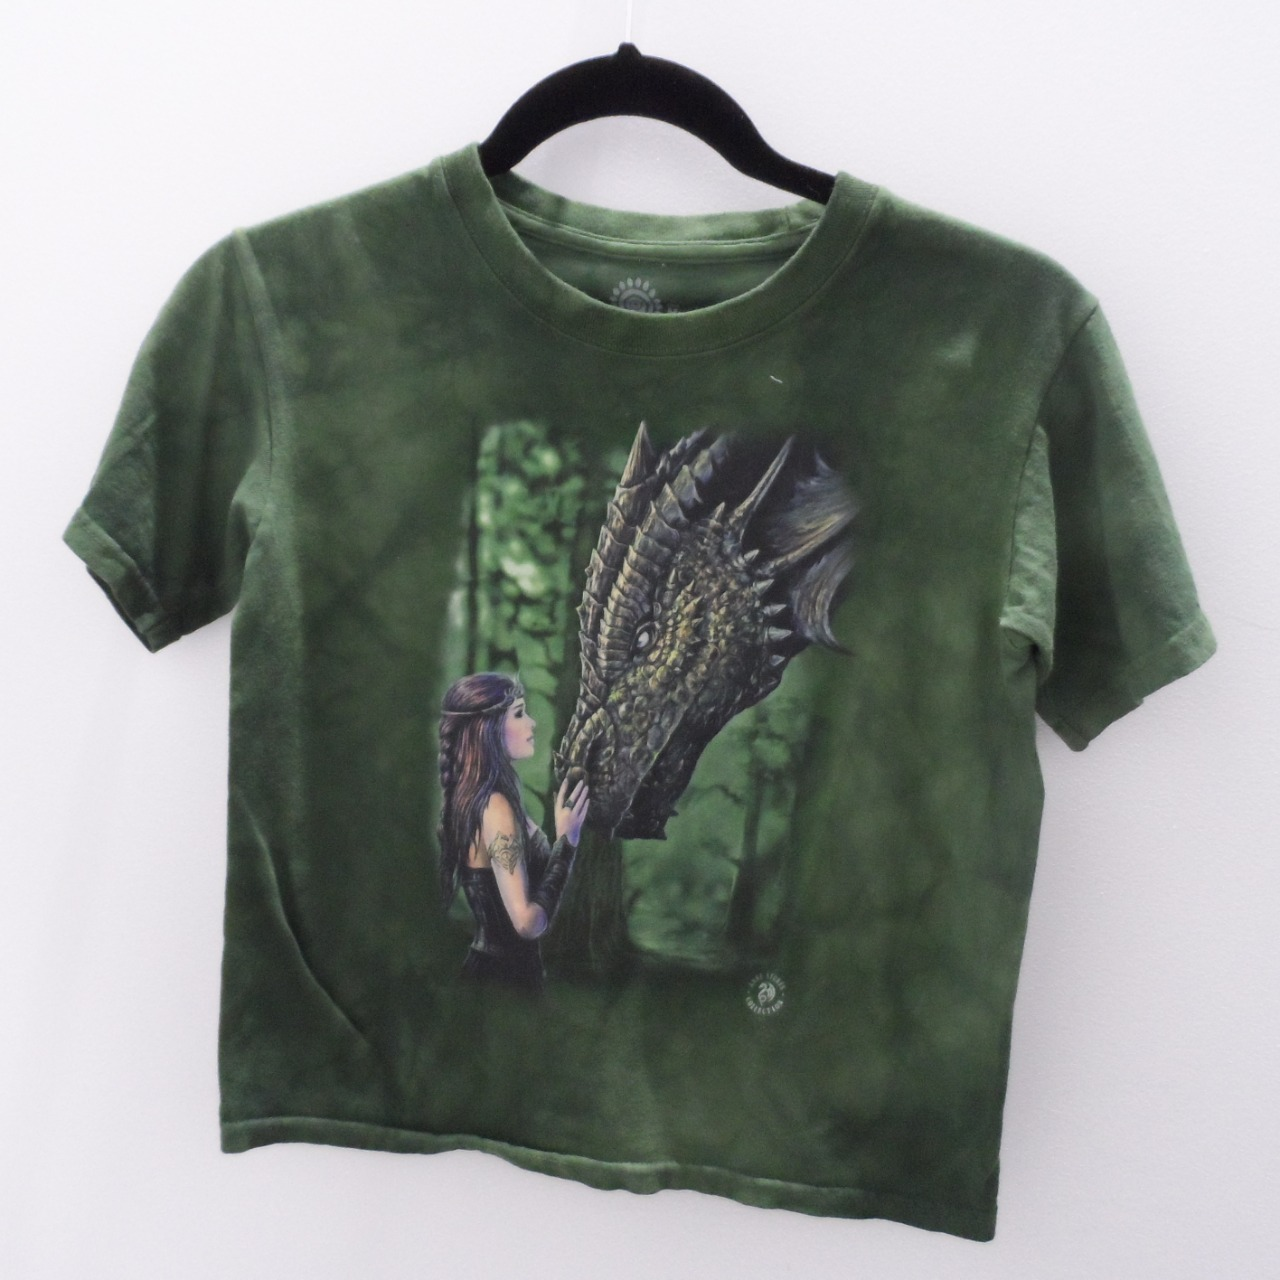 Childrens Anne Stokes Dragon Print T-Shirt, Child Size M